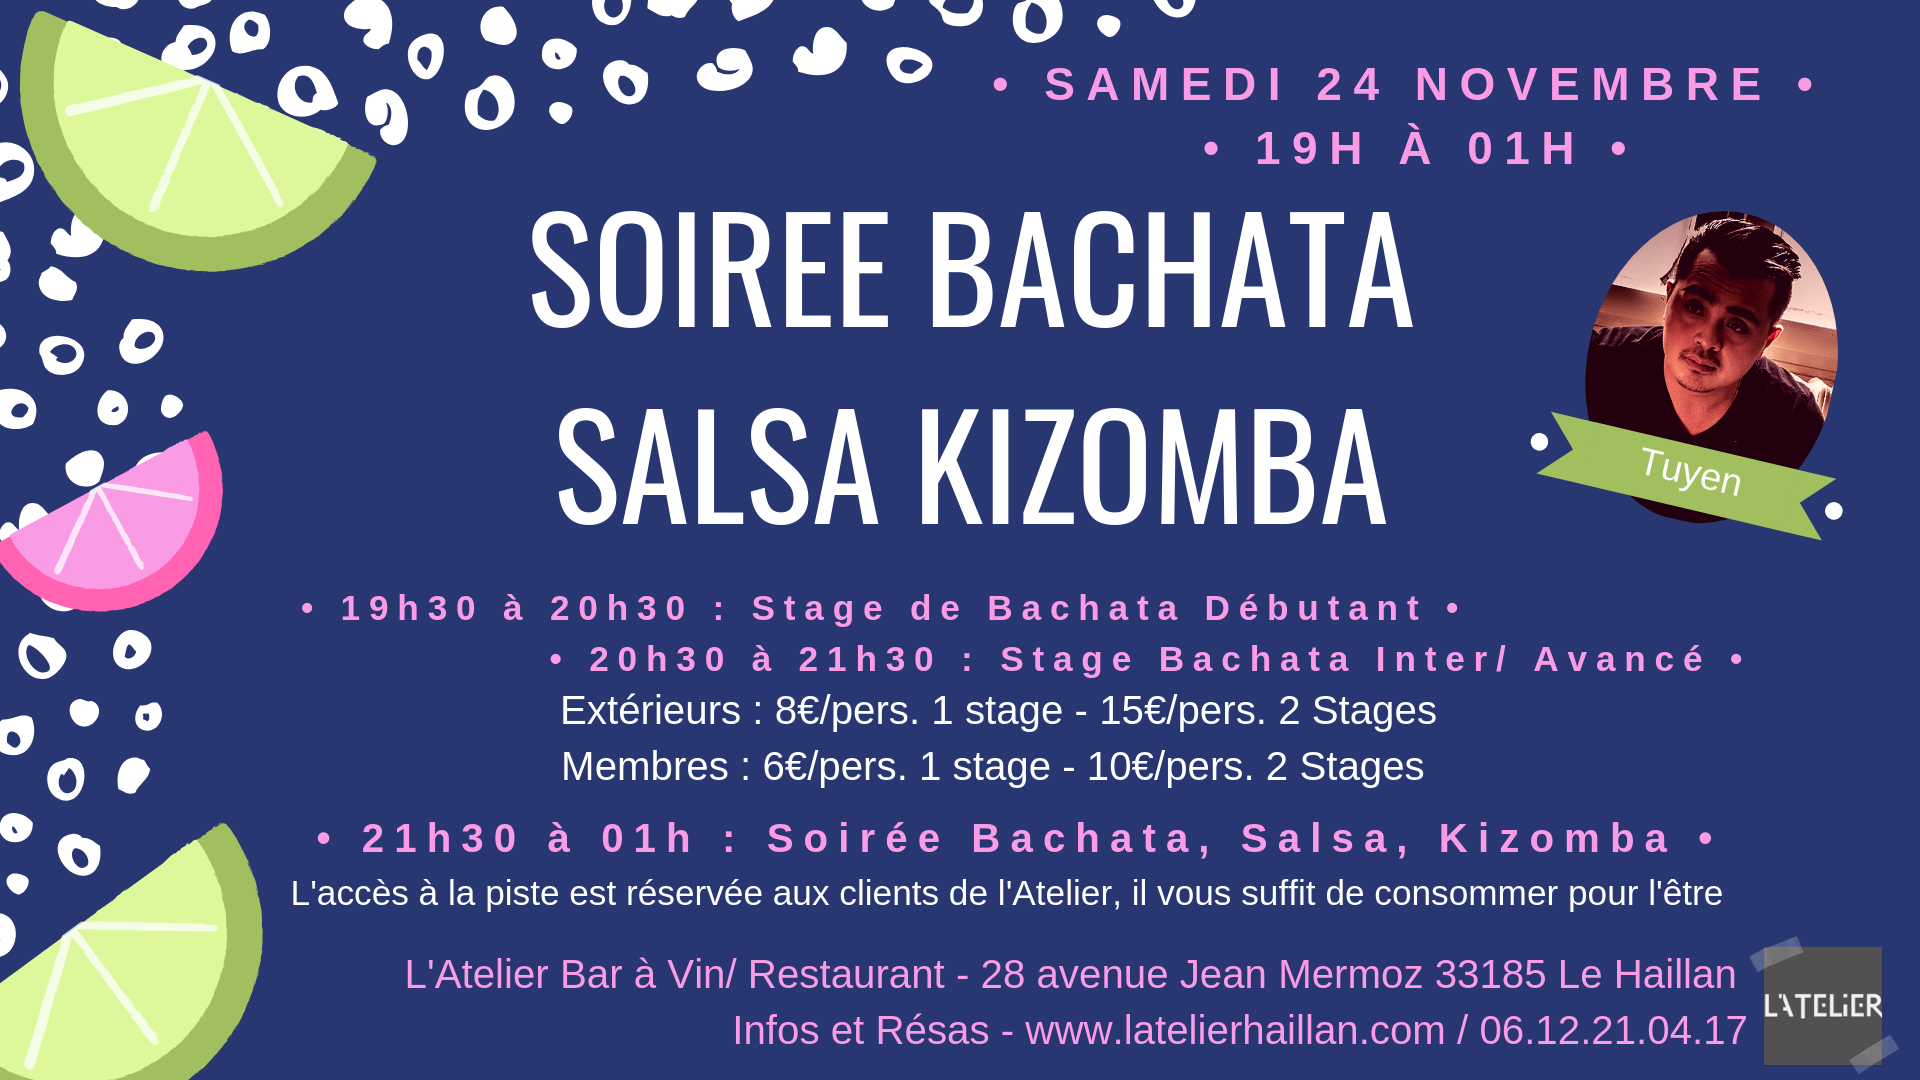 Soirée Bachata, Salsa et Kizomba avec Tuyen - 2 Stages de Bachata